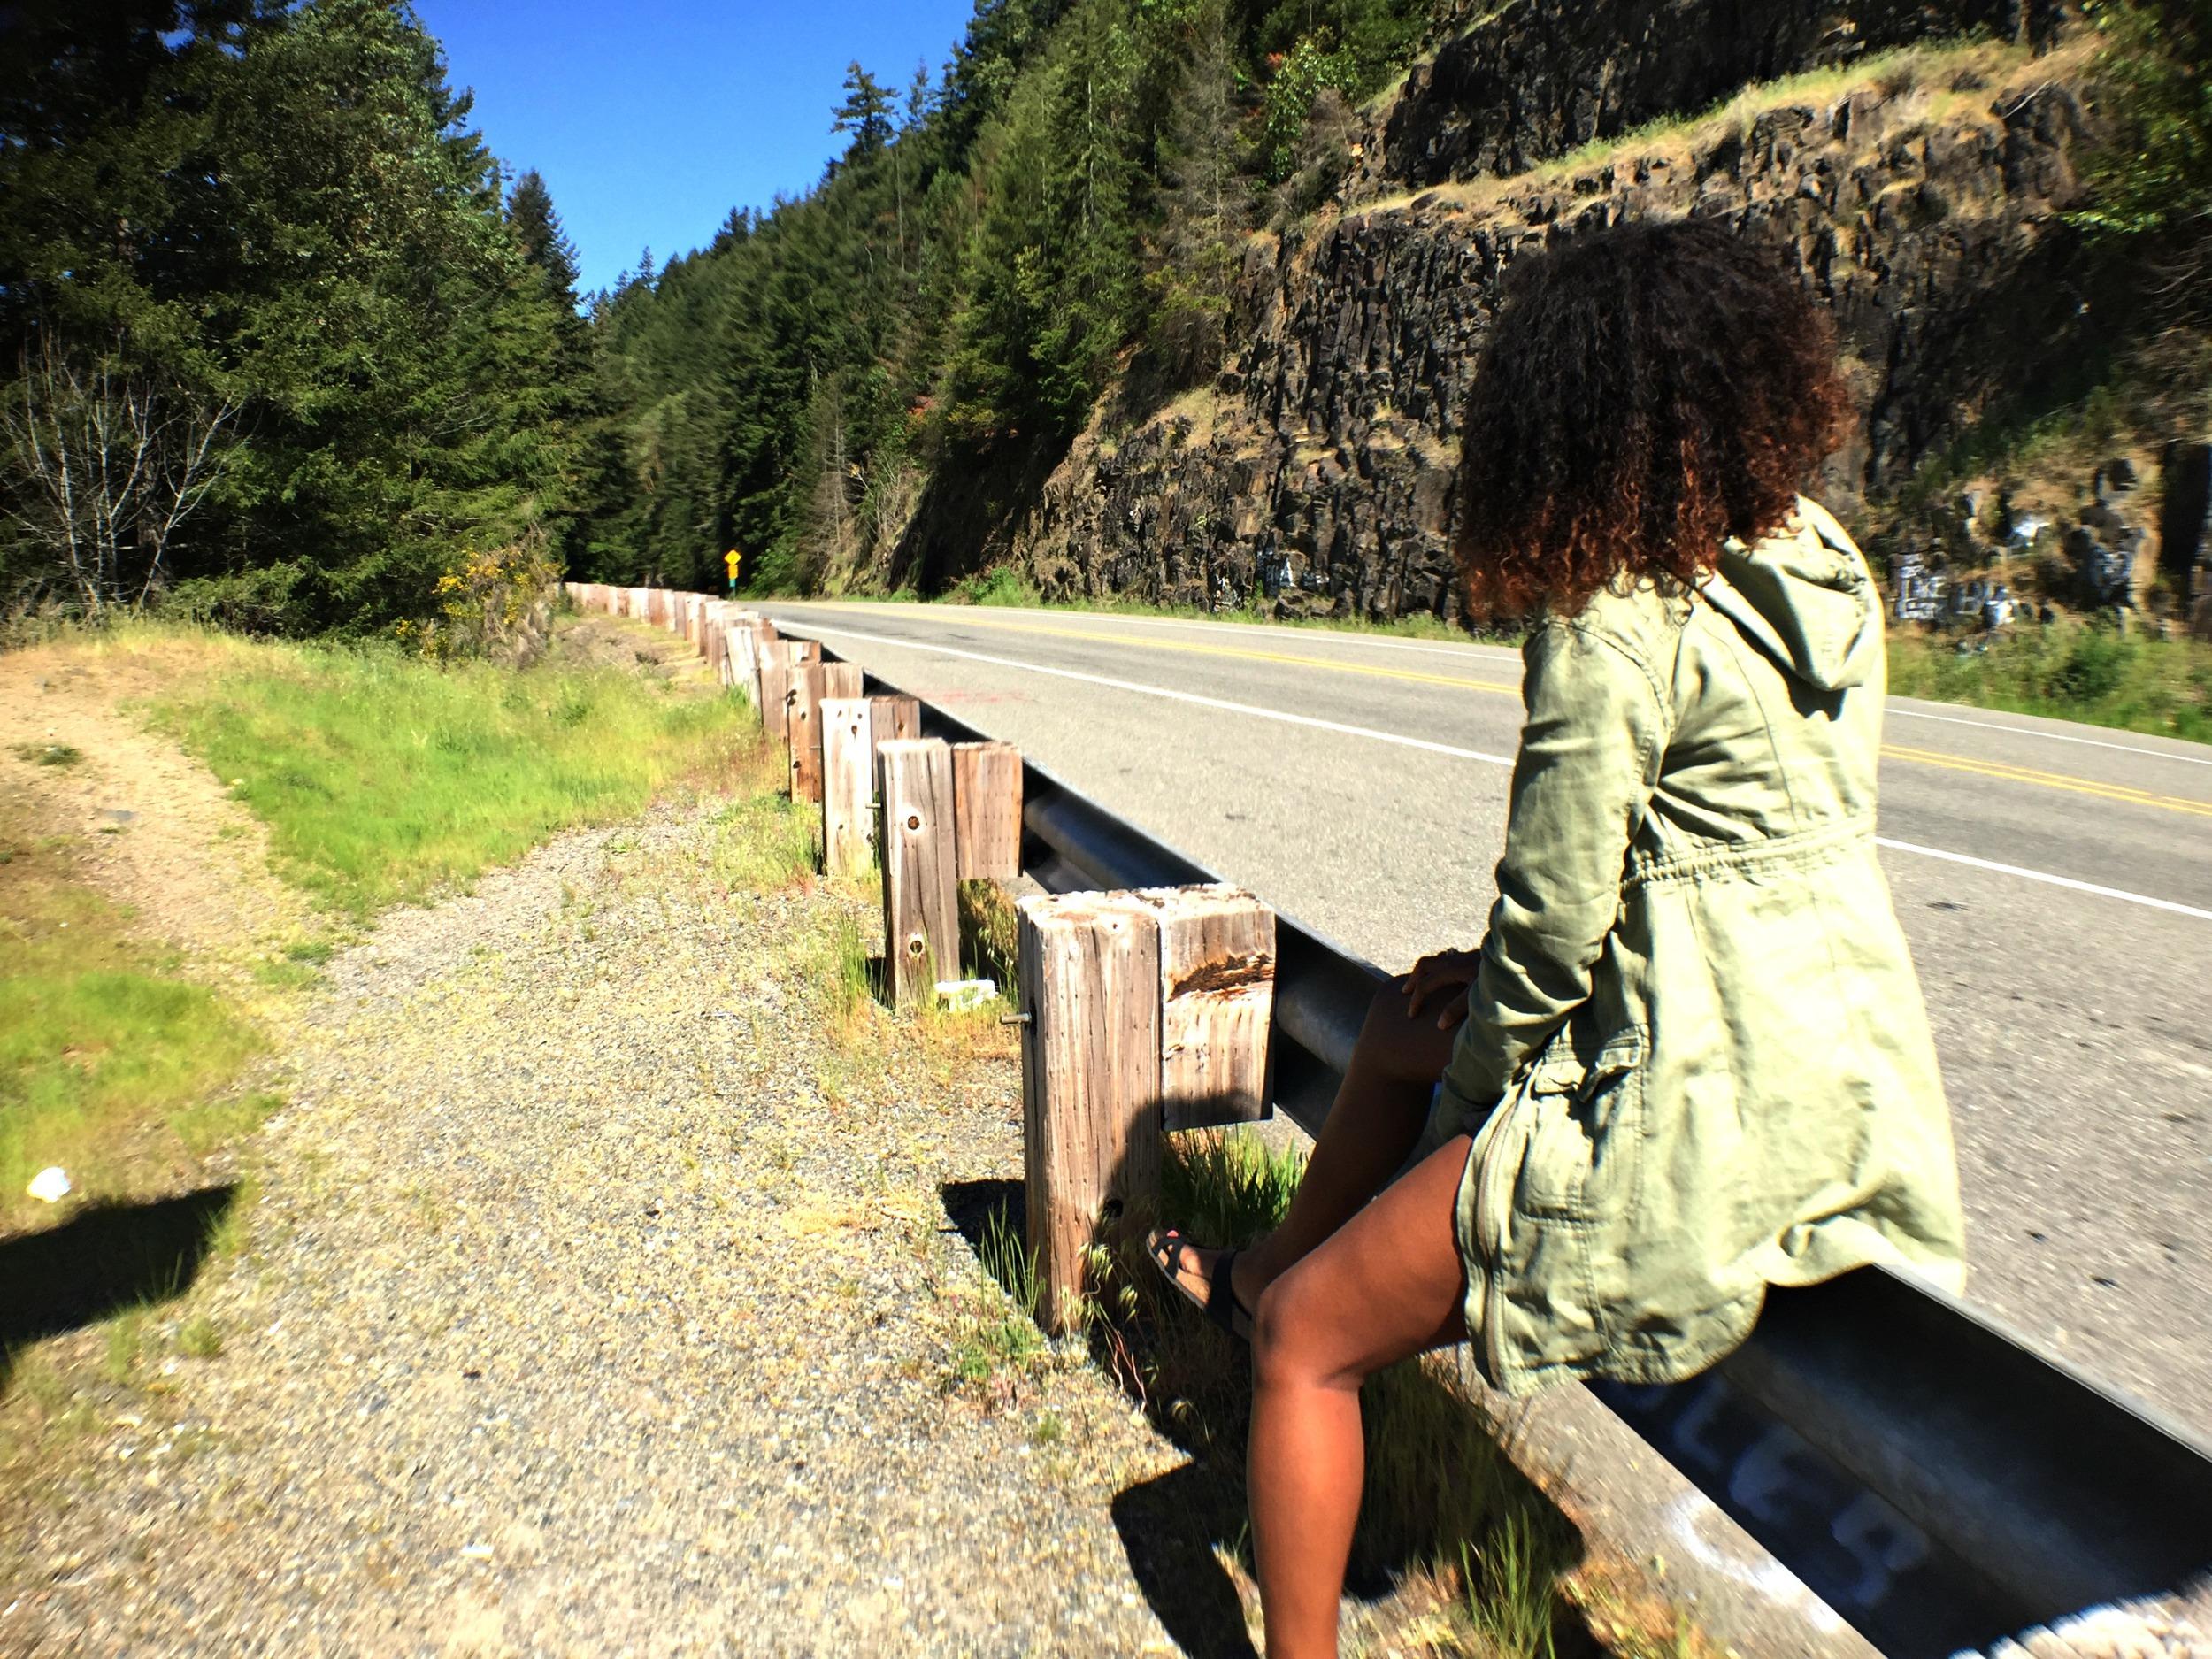 Random photo stops on the way to Mount Rainier.